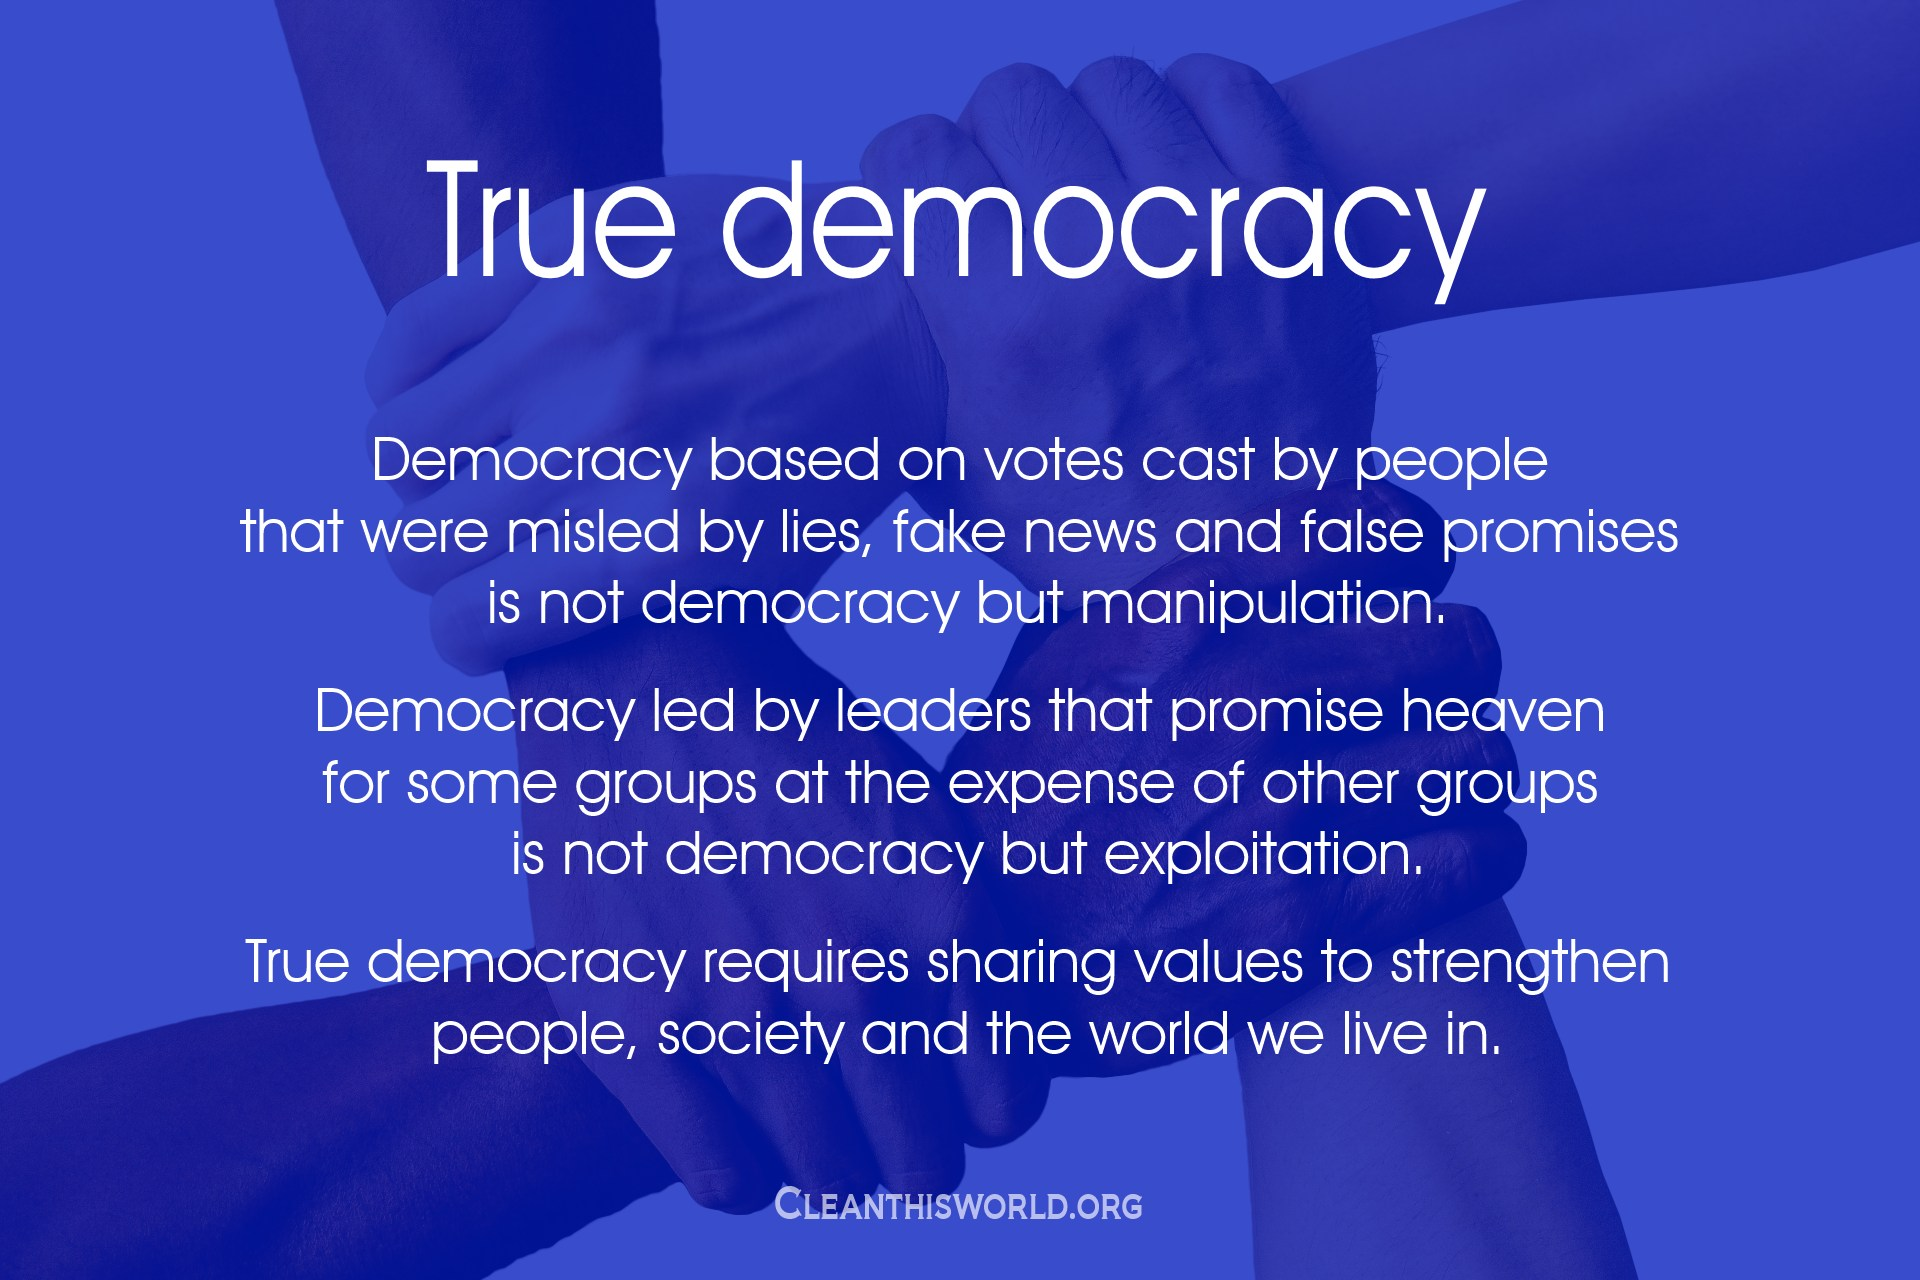 True democracy